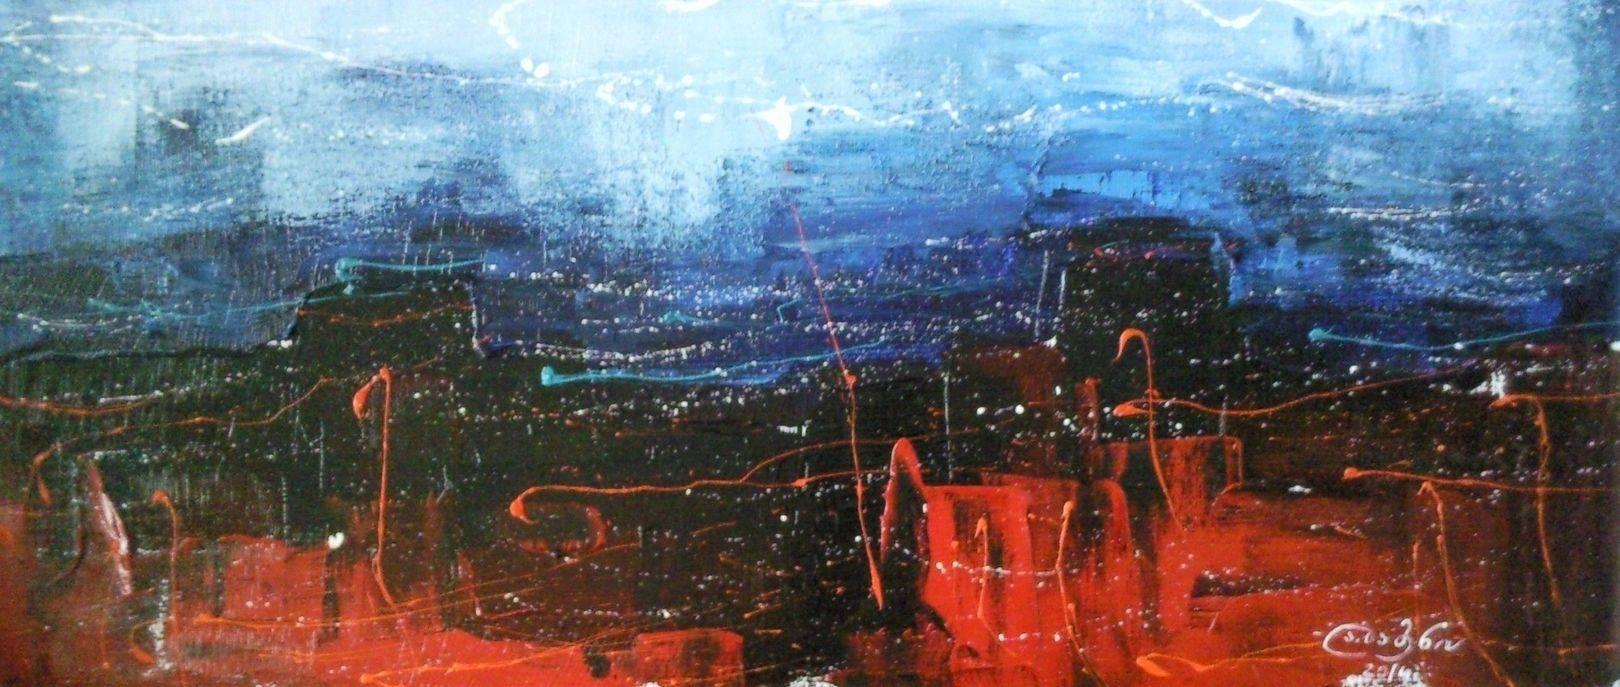 «Ночной город. Перый снег»    холст, масло «City at night. First snow»          oil on canvas                                                       30x70,  2014